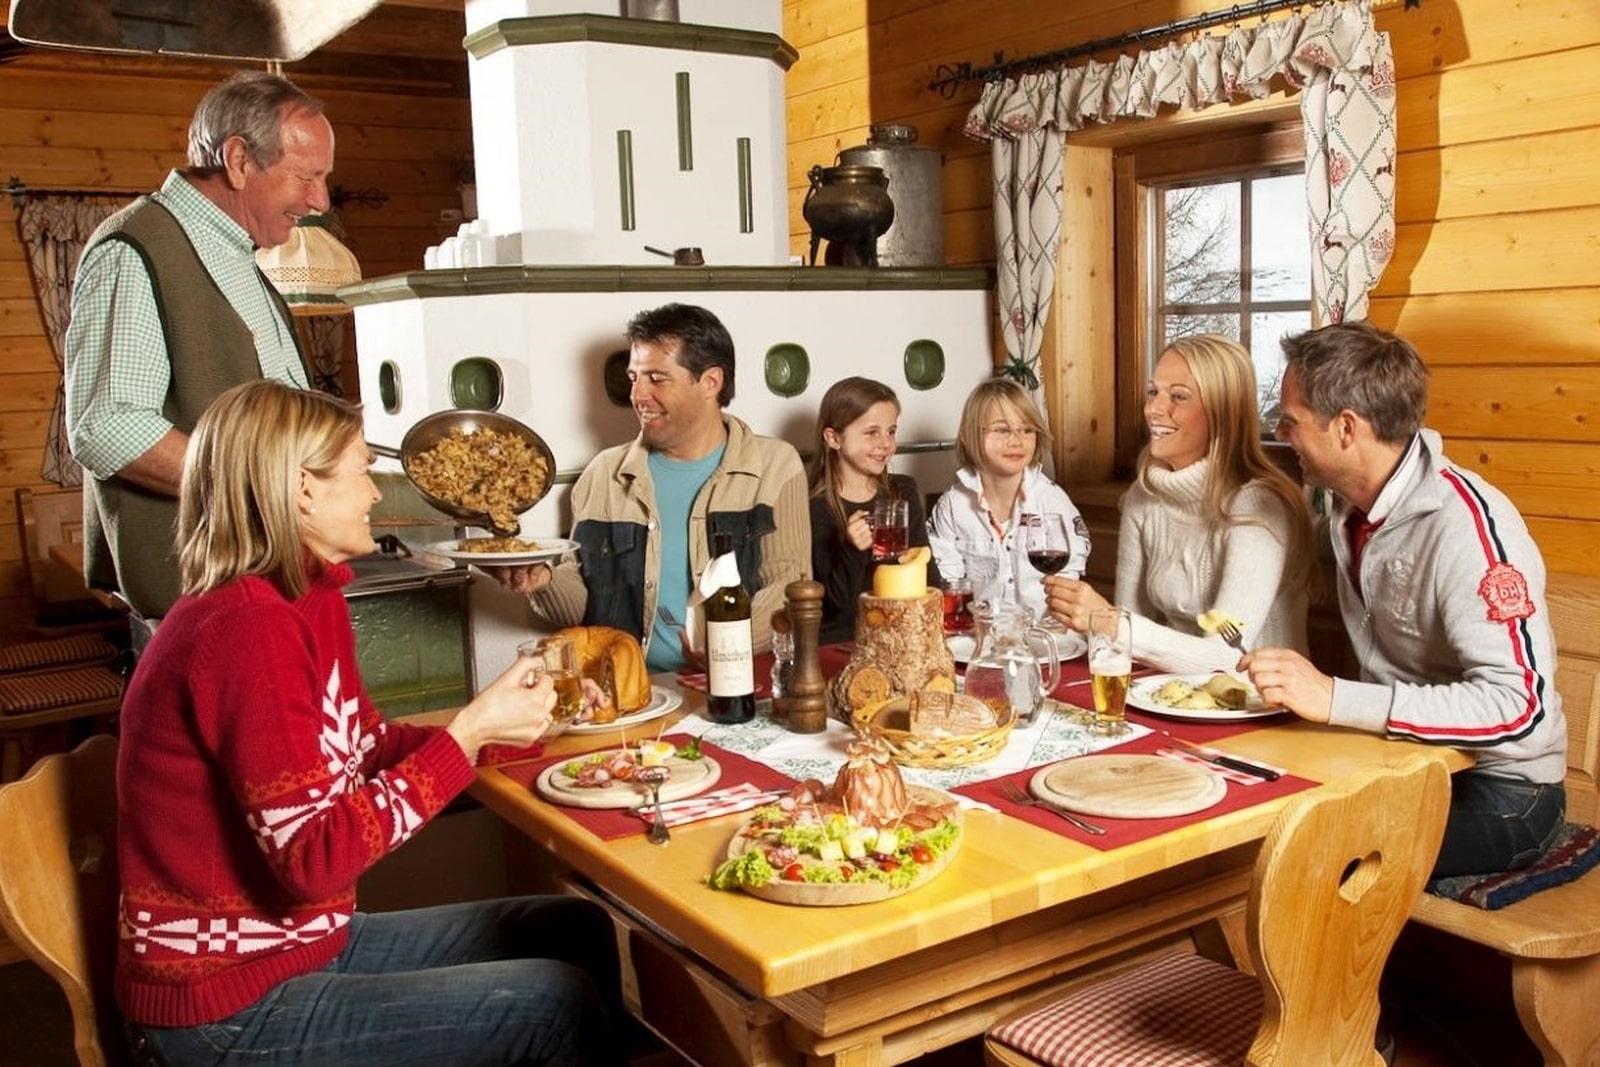 Heidi-Chalet-Falkert-Heidialm-Restaurant-Zirbenhuette-Familie